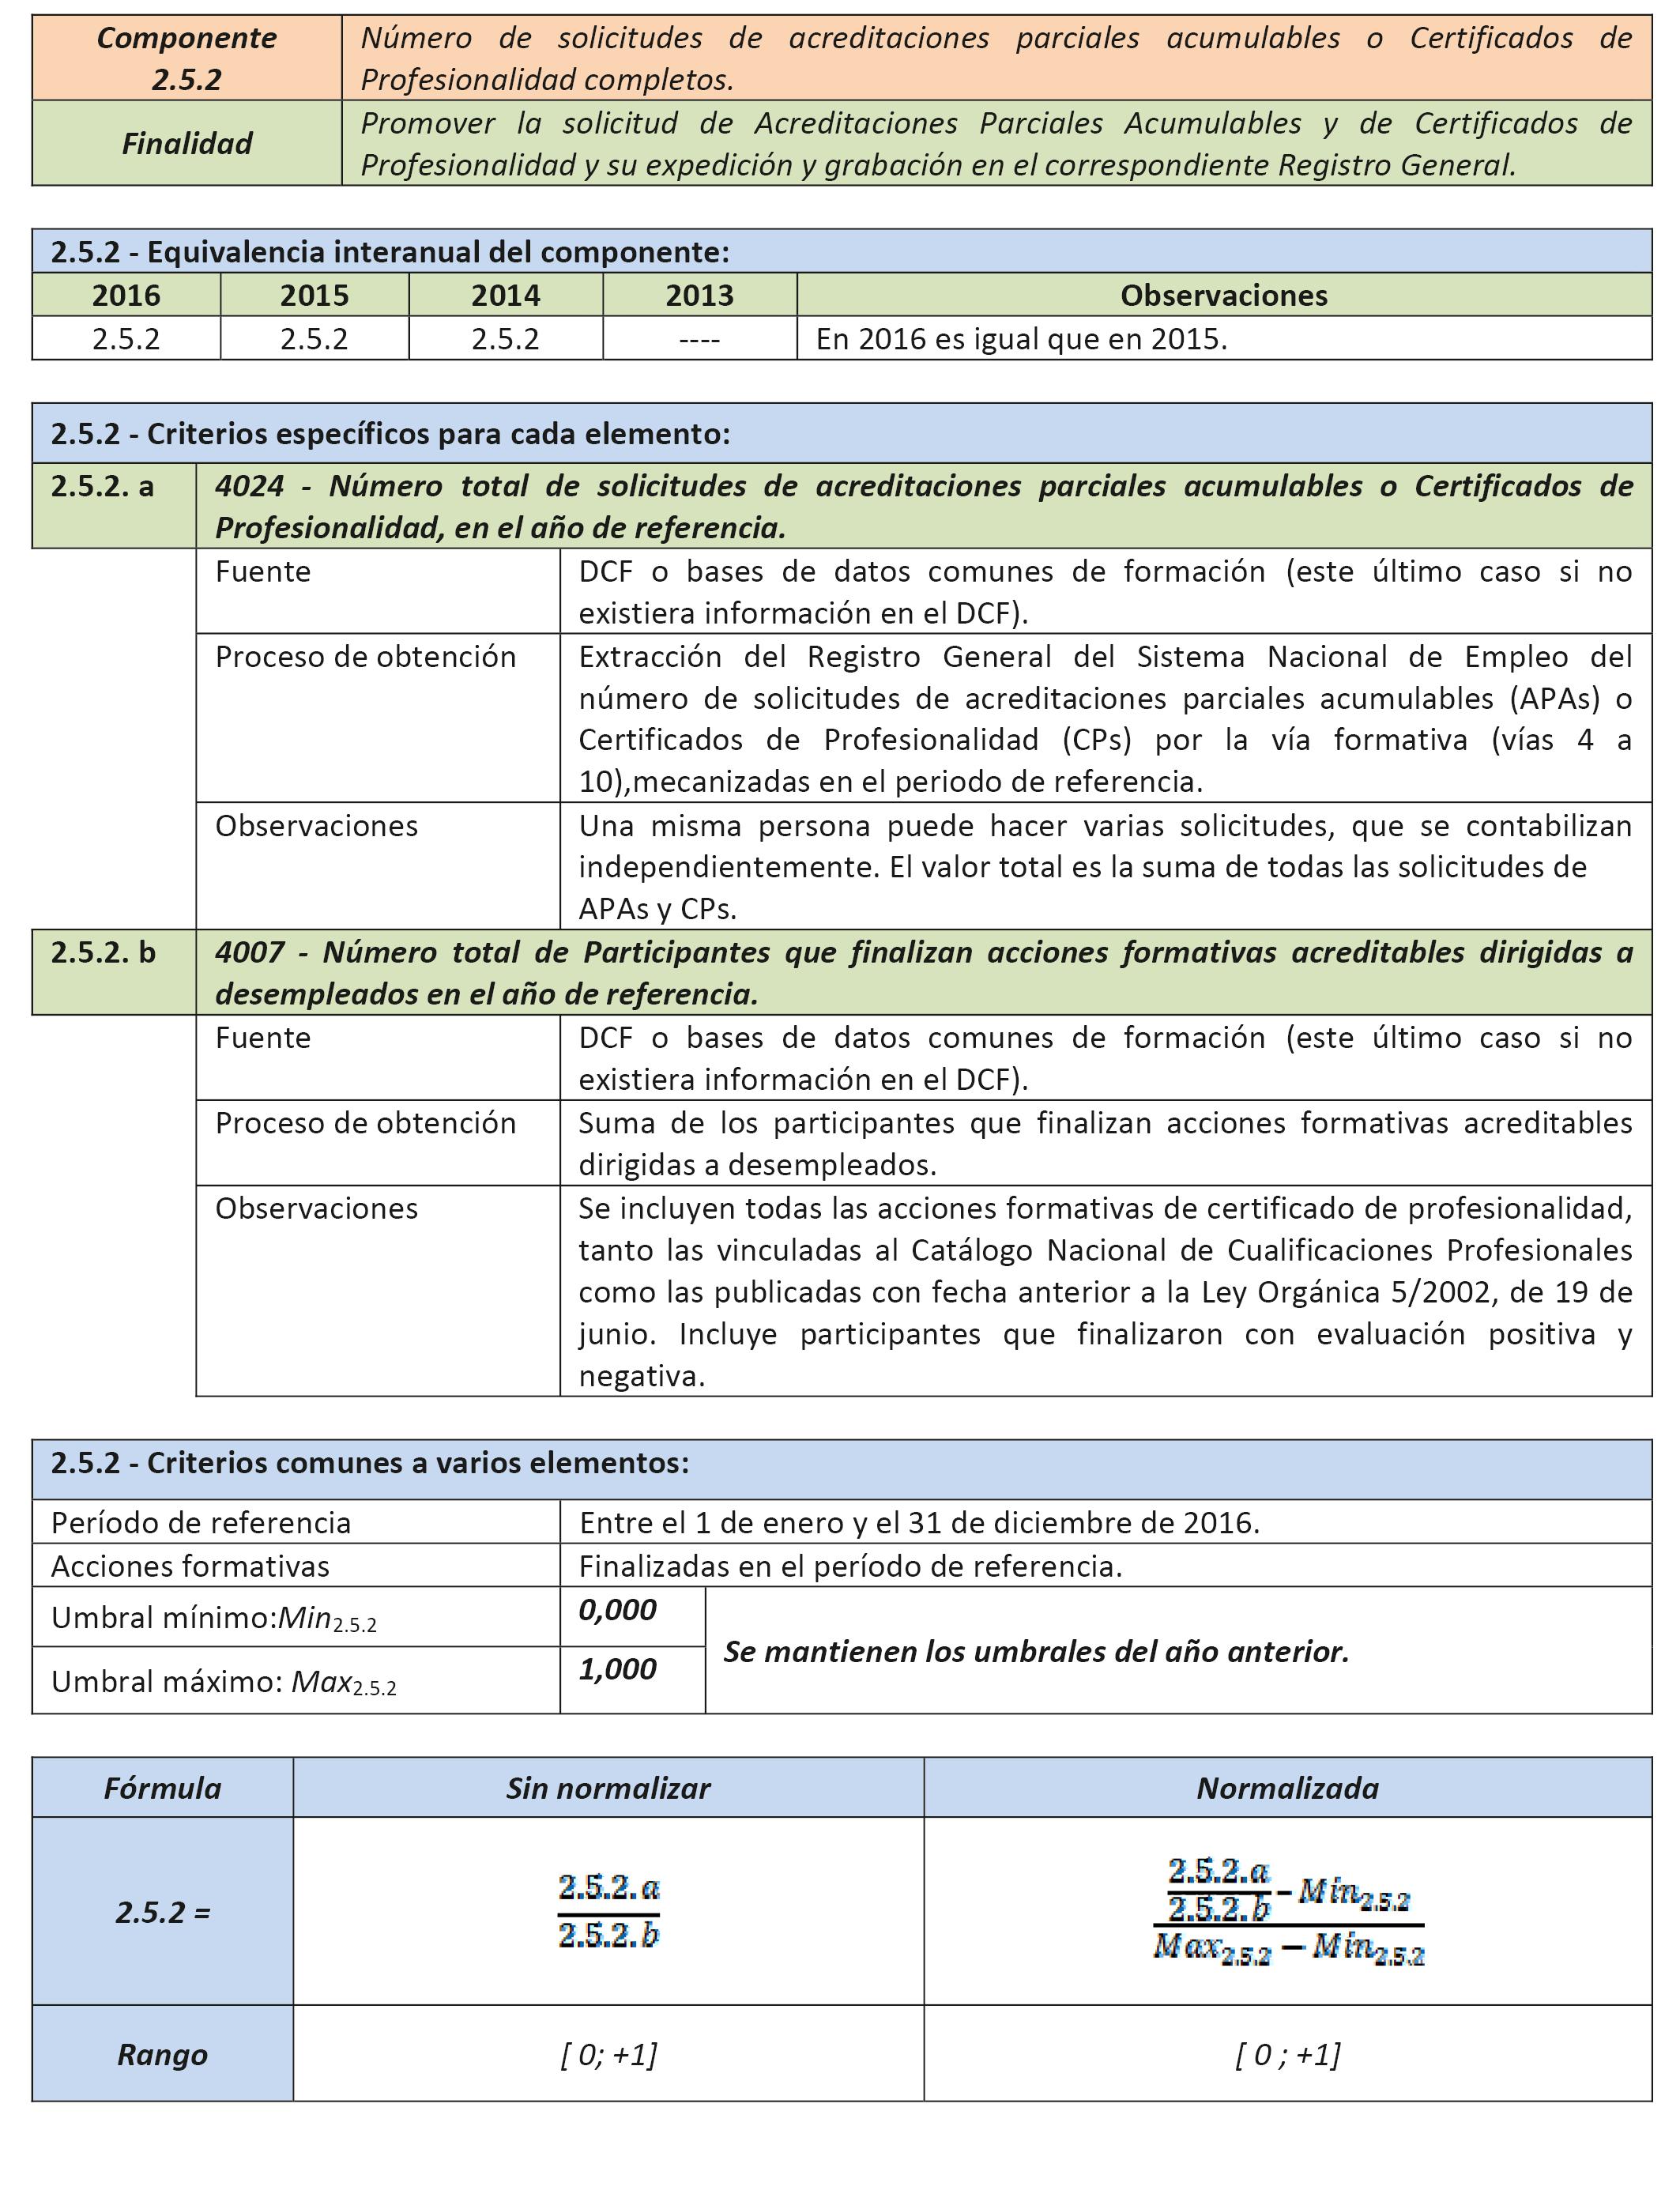 BOE.es - Documento BOE-A-2017-7517